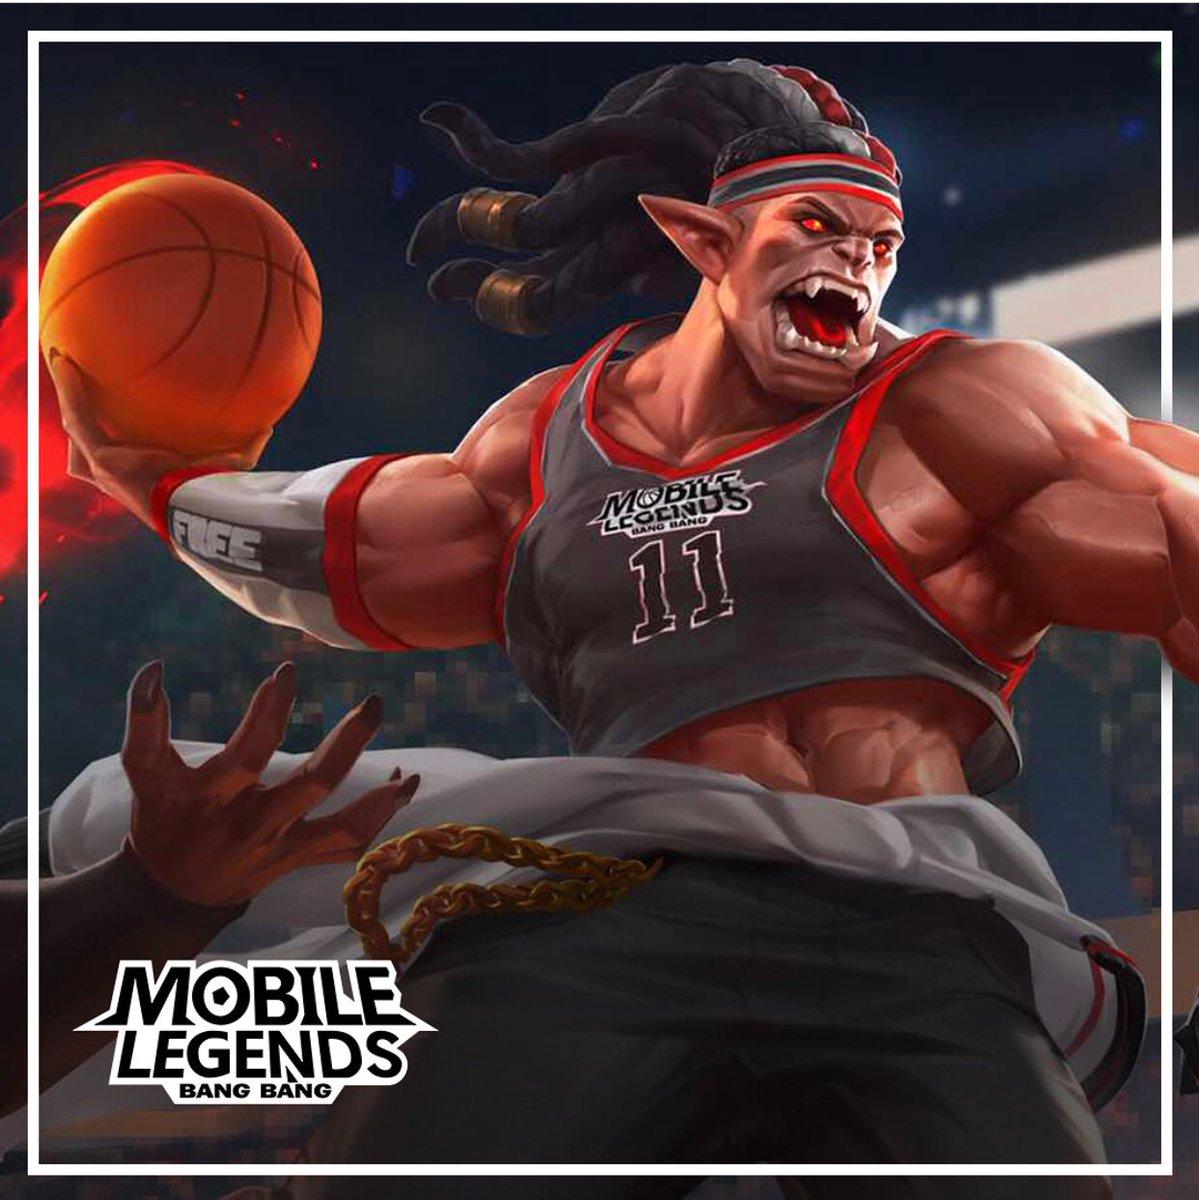 Mobile Legends Philippines On Twitter New Skin Balmond Savage Hunter Skin Coming Soon Mobilelegends Mobilelegendsph Mobilelegendsbangbang Mobilelegendsphilippines Https T Co Dc9kztrfko